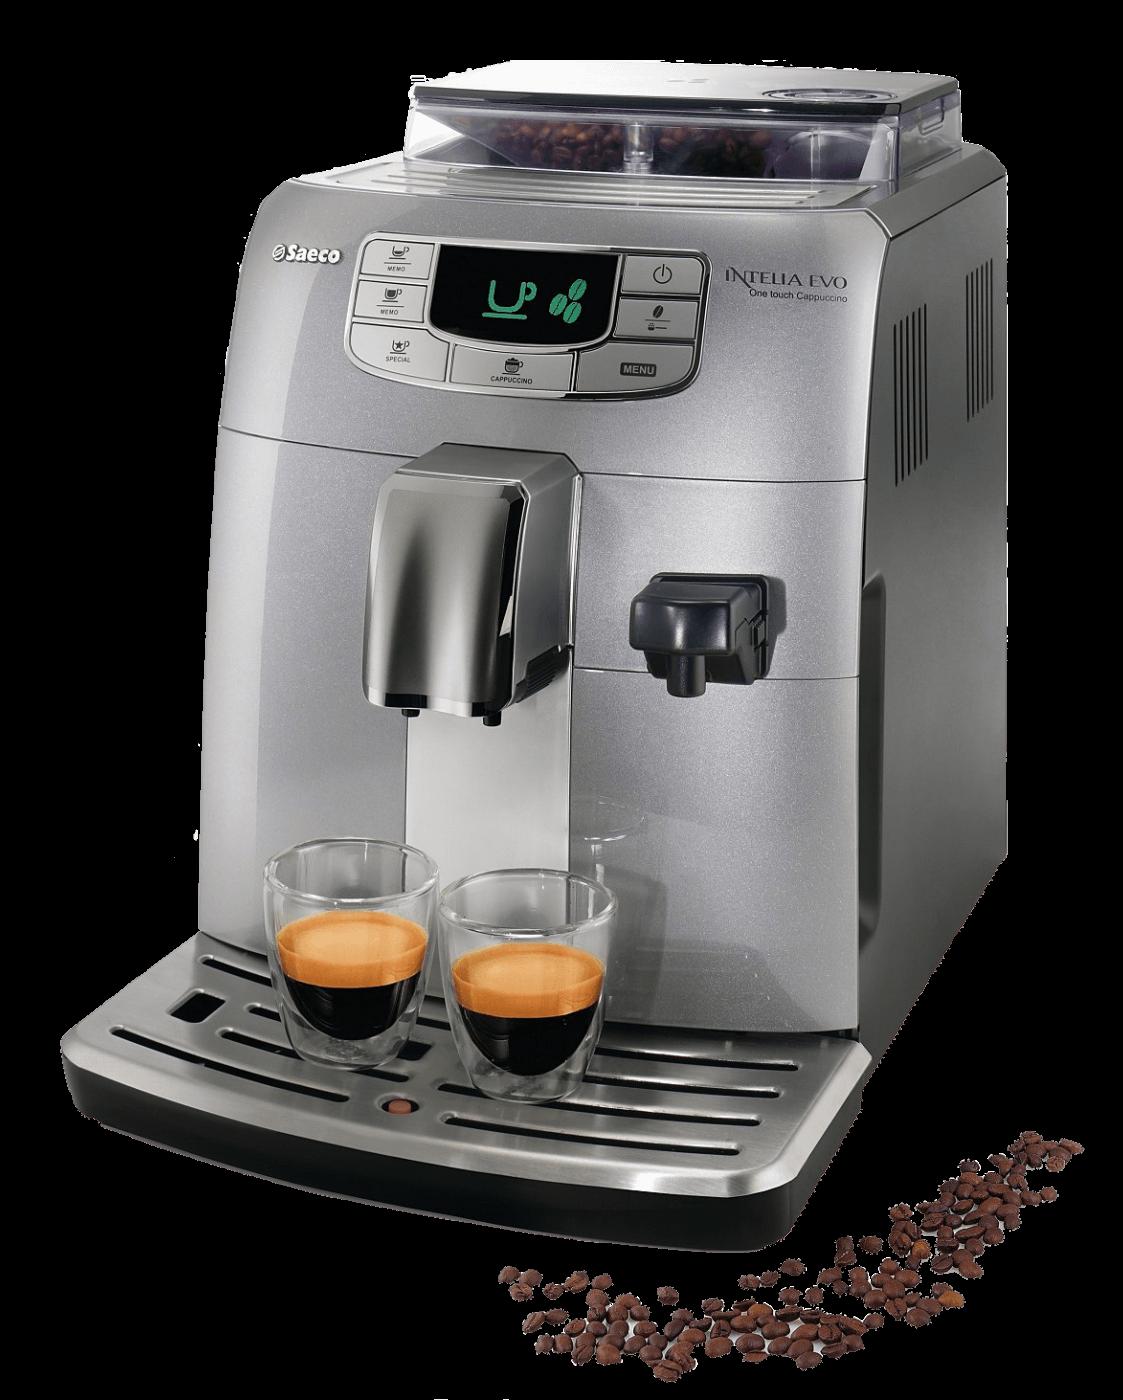 saeco espresso machine saeco talea ring philips saeco intelia class automatic espresso machine. Black Bedroom Furniture Sets. Home Design Ideas